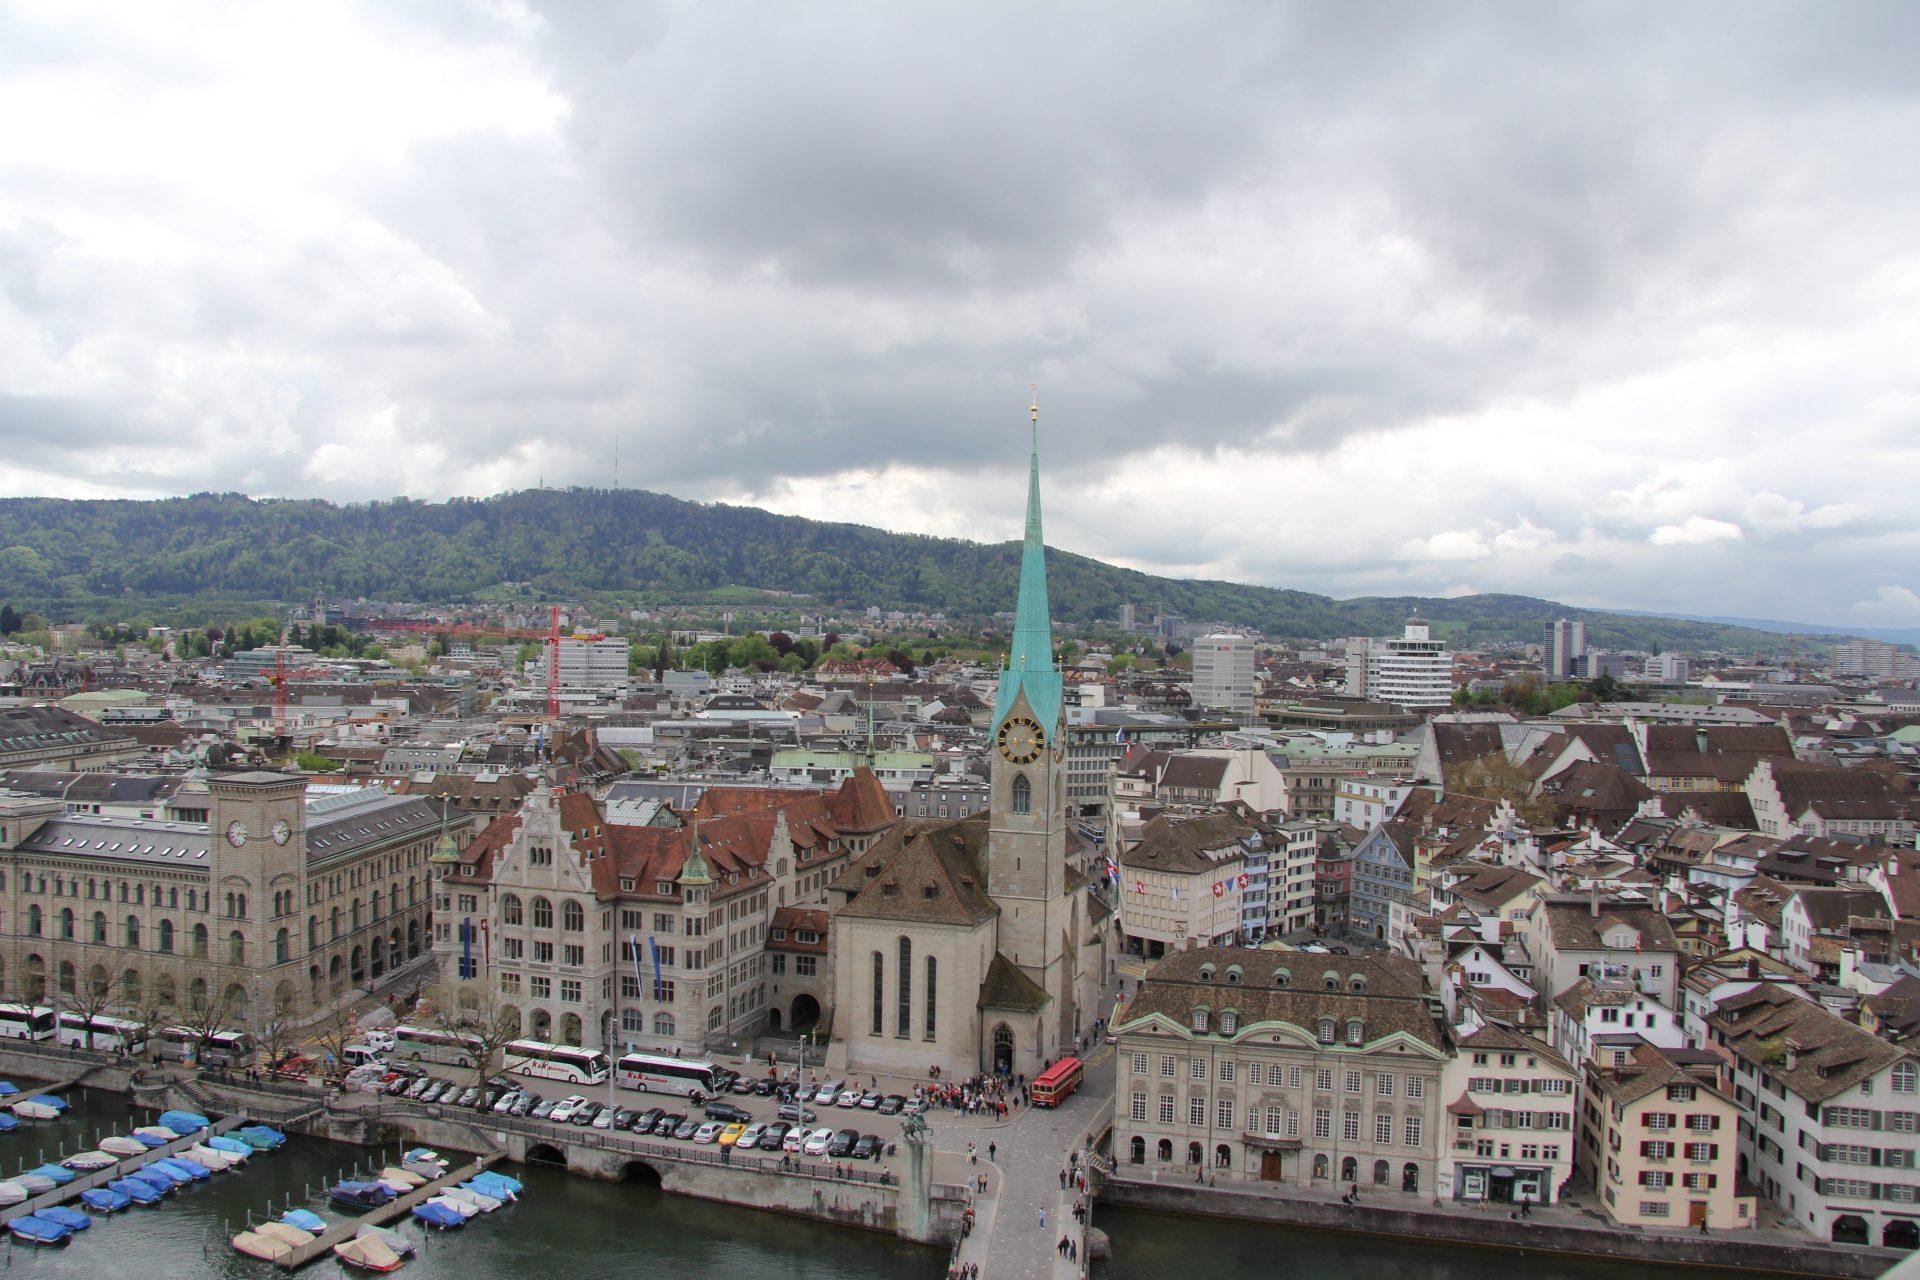 Фраумюнстер, Цюрих, Швейцария. Апрель, 2013